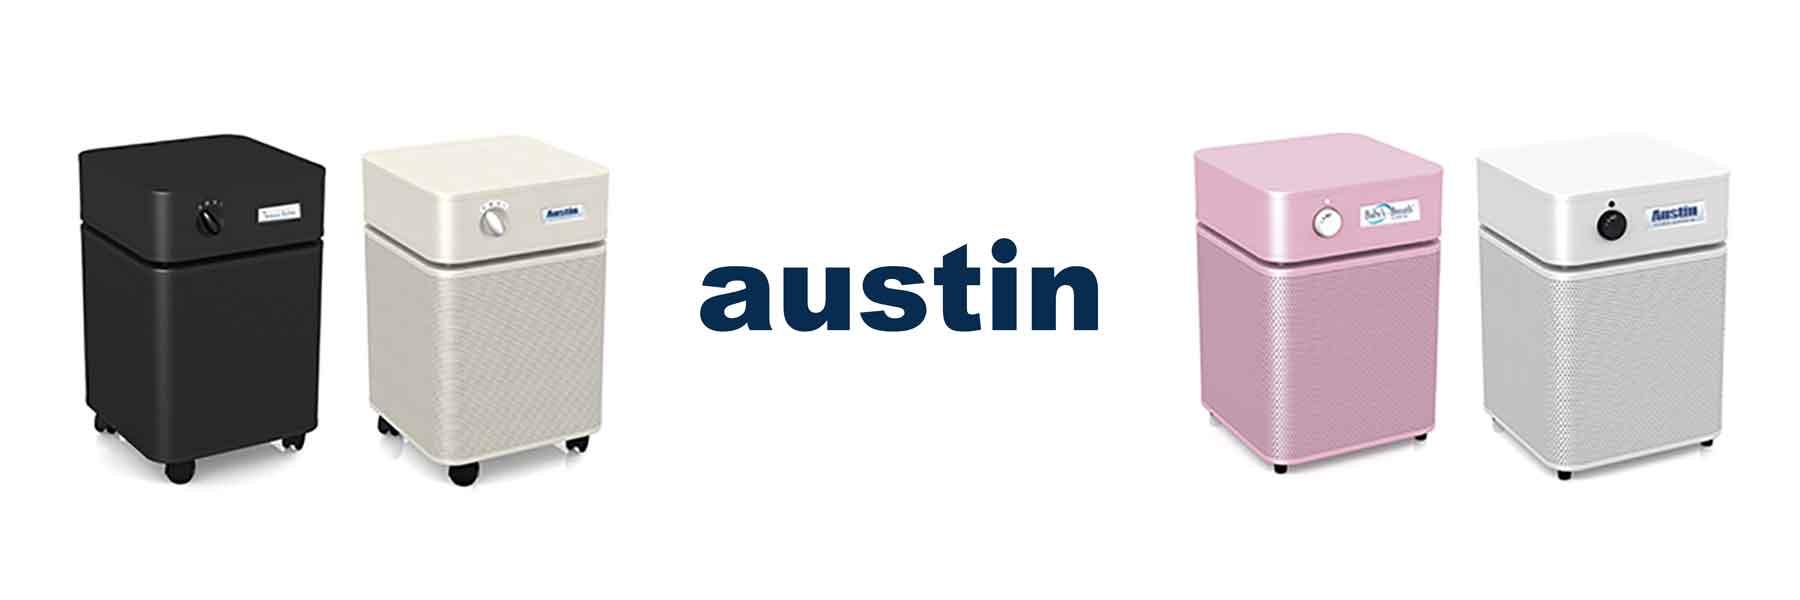 Austin Air Purifiers Review